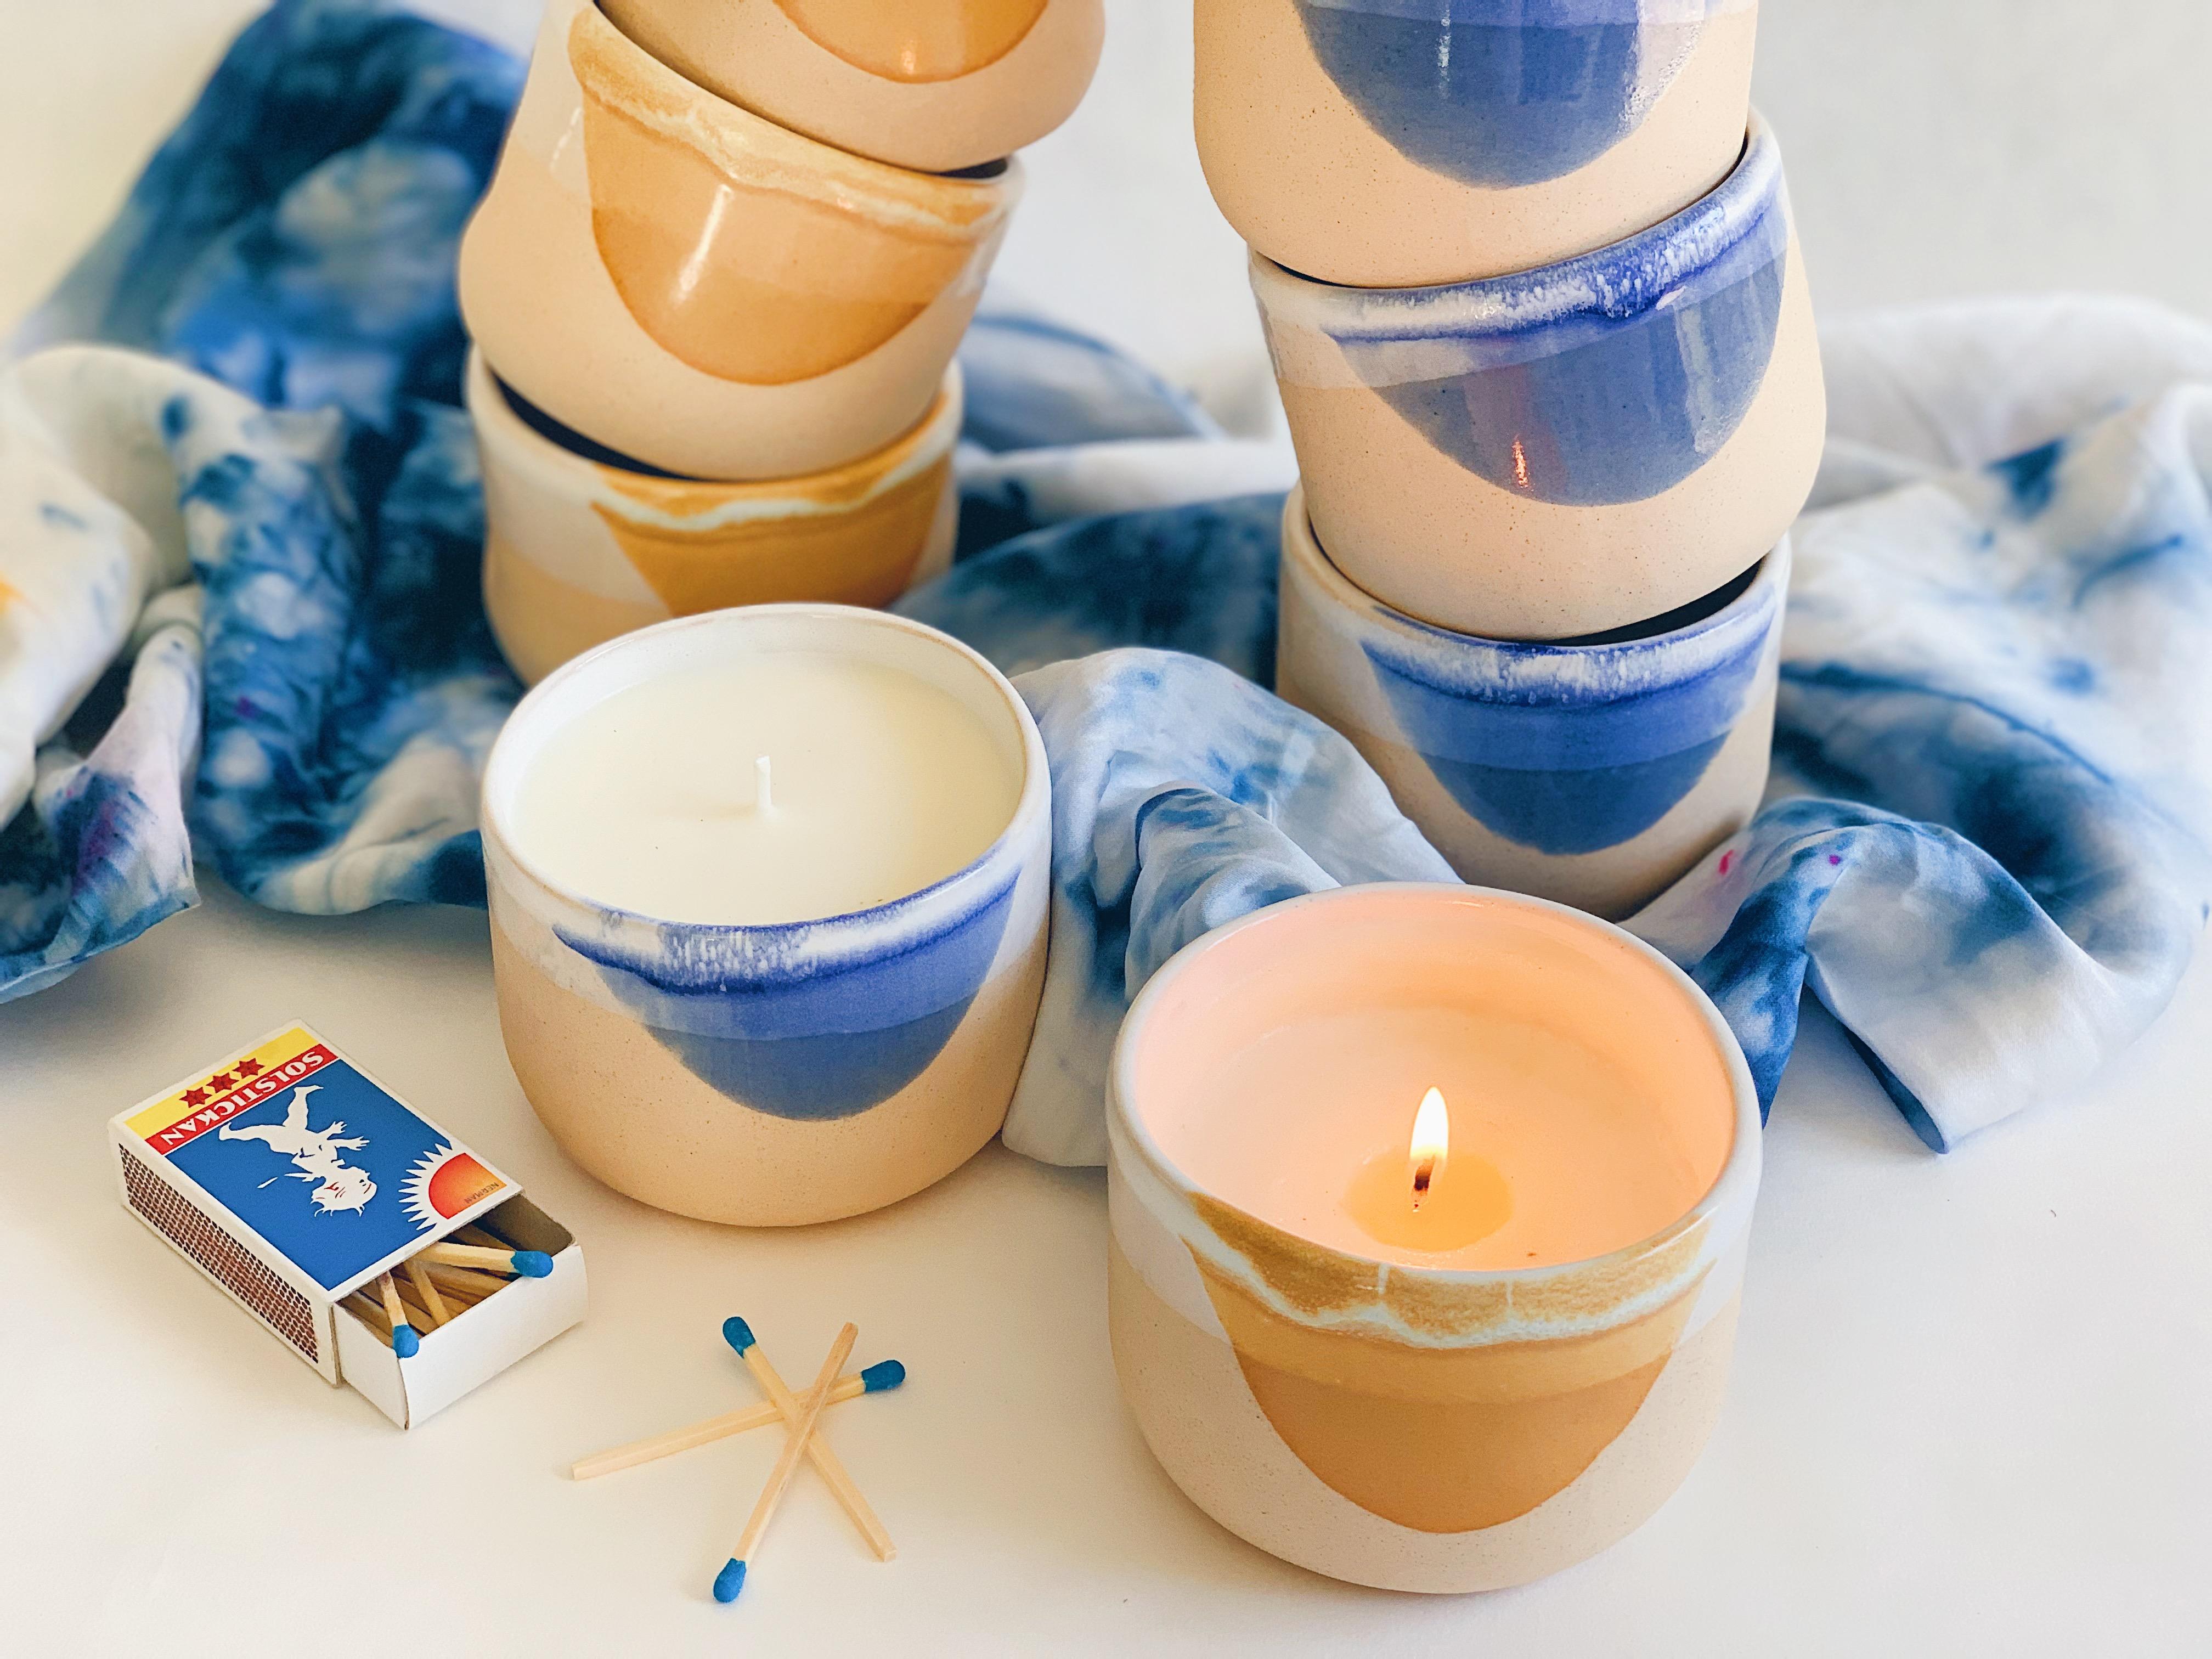 wu-haus-candle-03-alison-ceramic-fefo-studio-crosby-elements